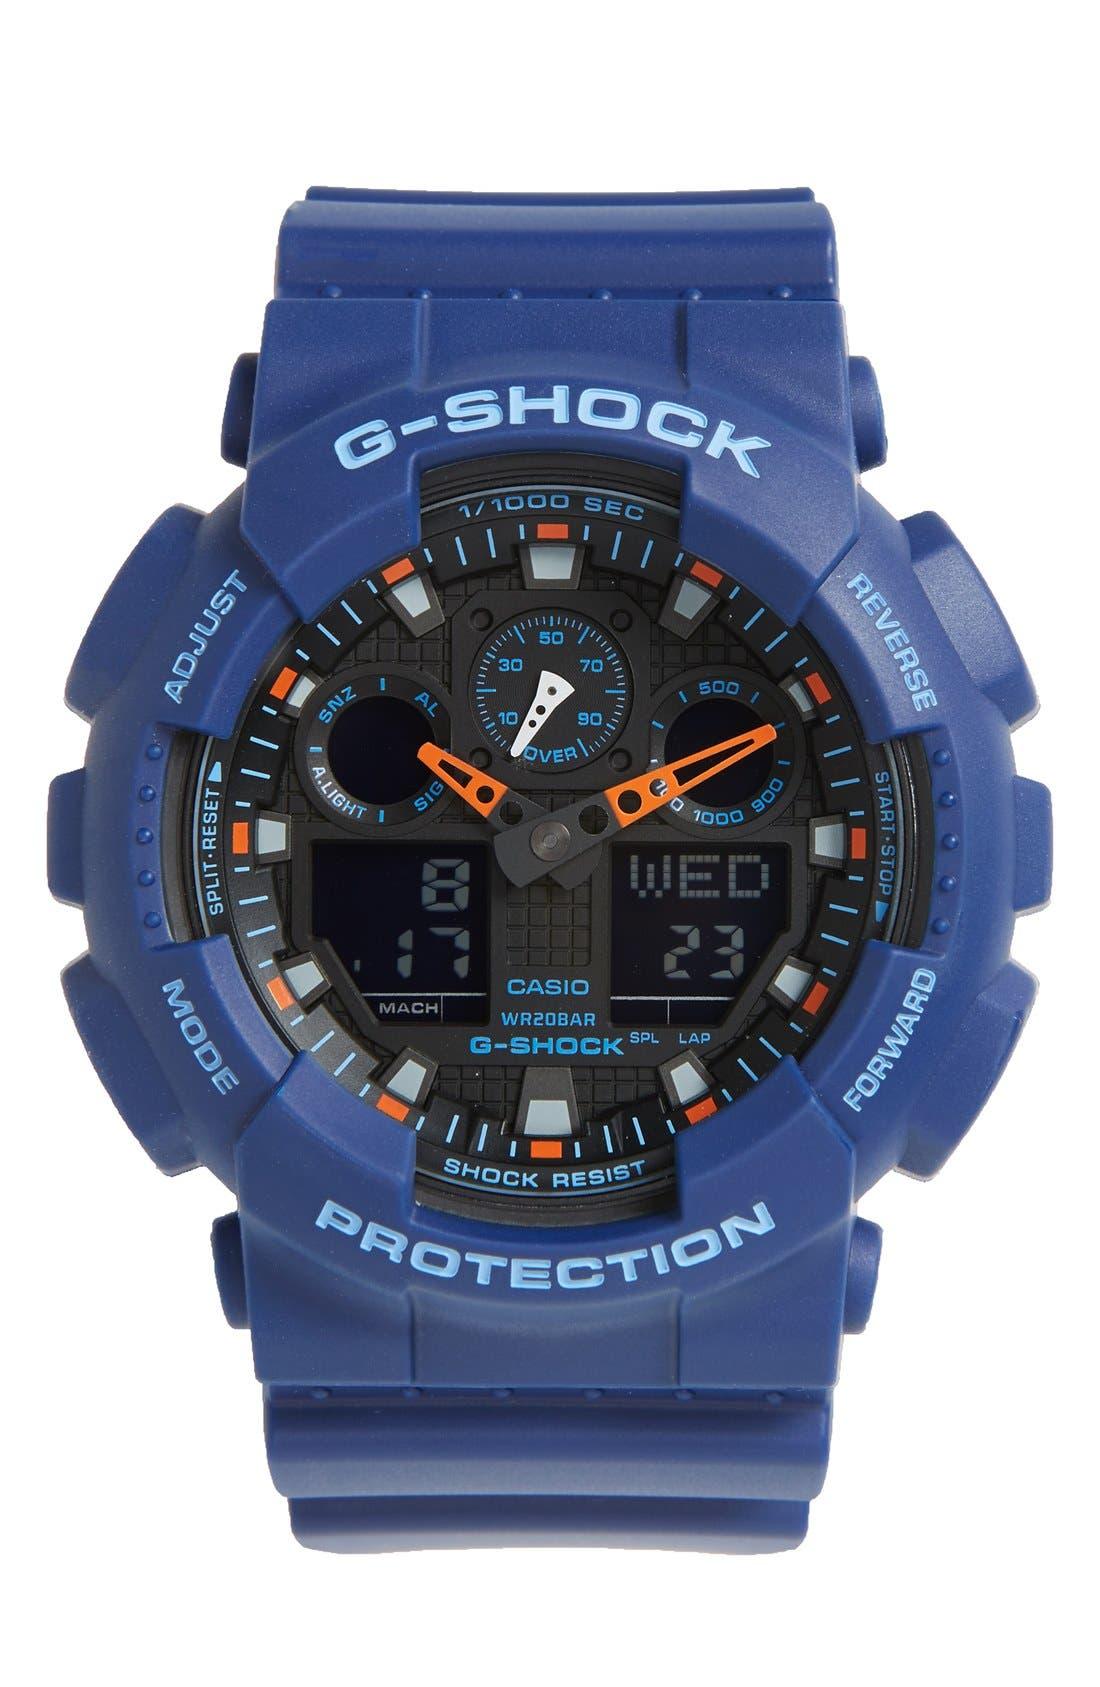 G-SHOCK BABY-G G-Shock 'Big Combi' Watch, 55mm x